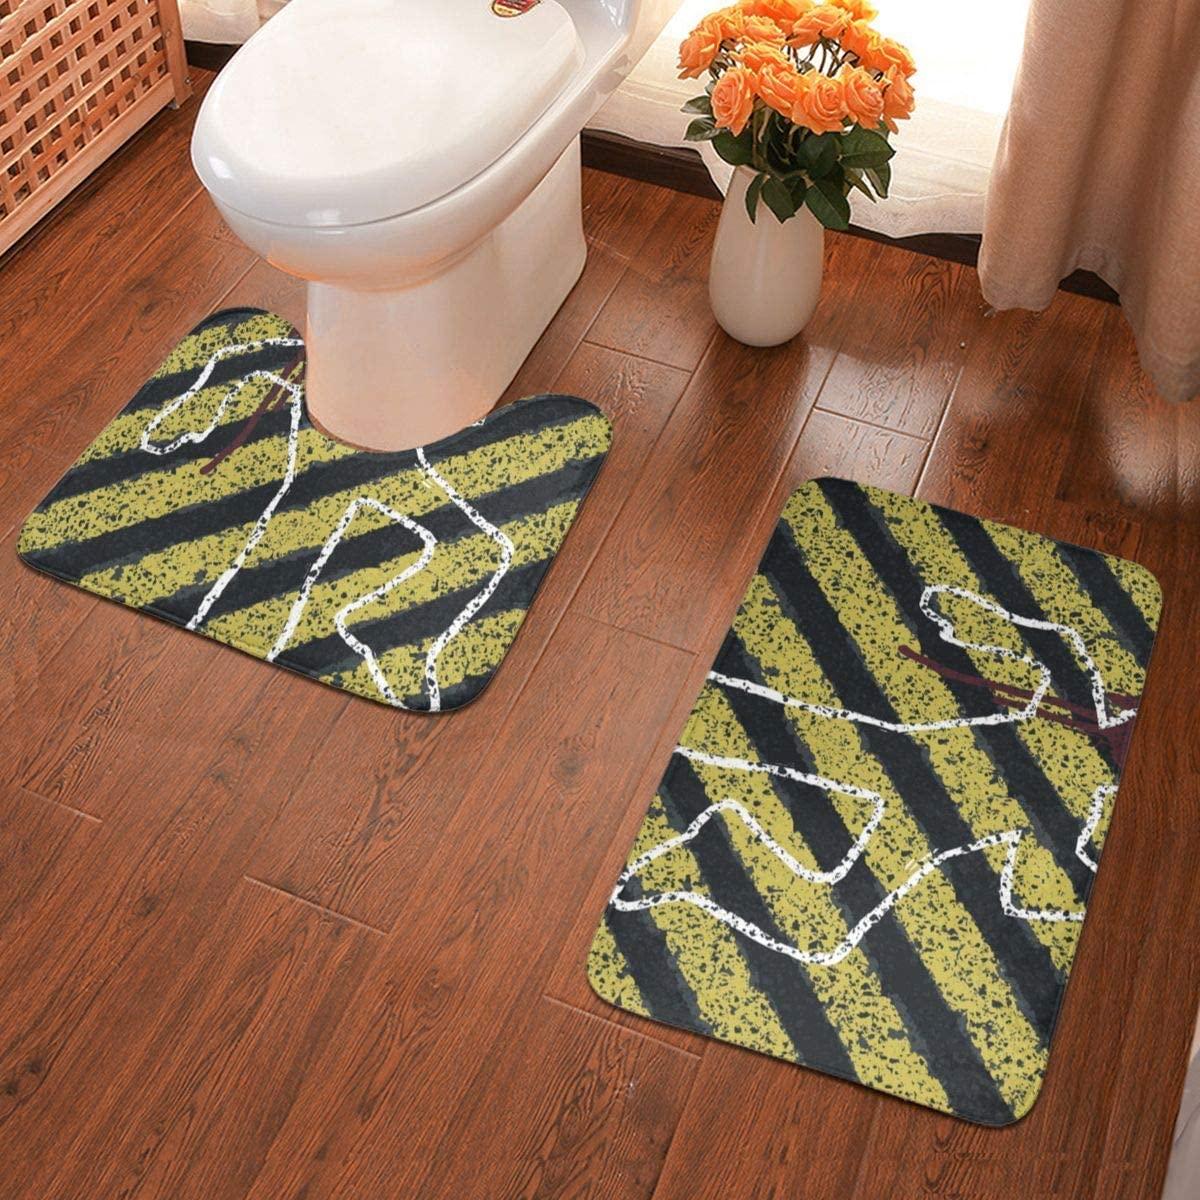 NiYoung Cozy Toilet Carpet Rugs Murder Crime Scene 2 Pack Bathroom Rug Shag for Bath Room Hotel & Spa, Fast Dry Anti Slip Nursery Rugs -1 Floor Pad Rugs + 1 U-Shaped Bath Rug